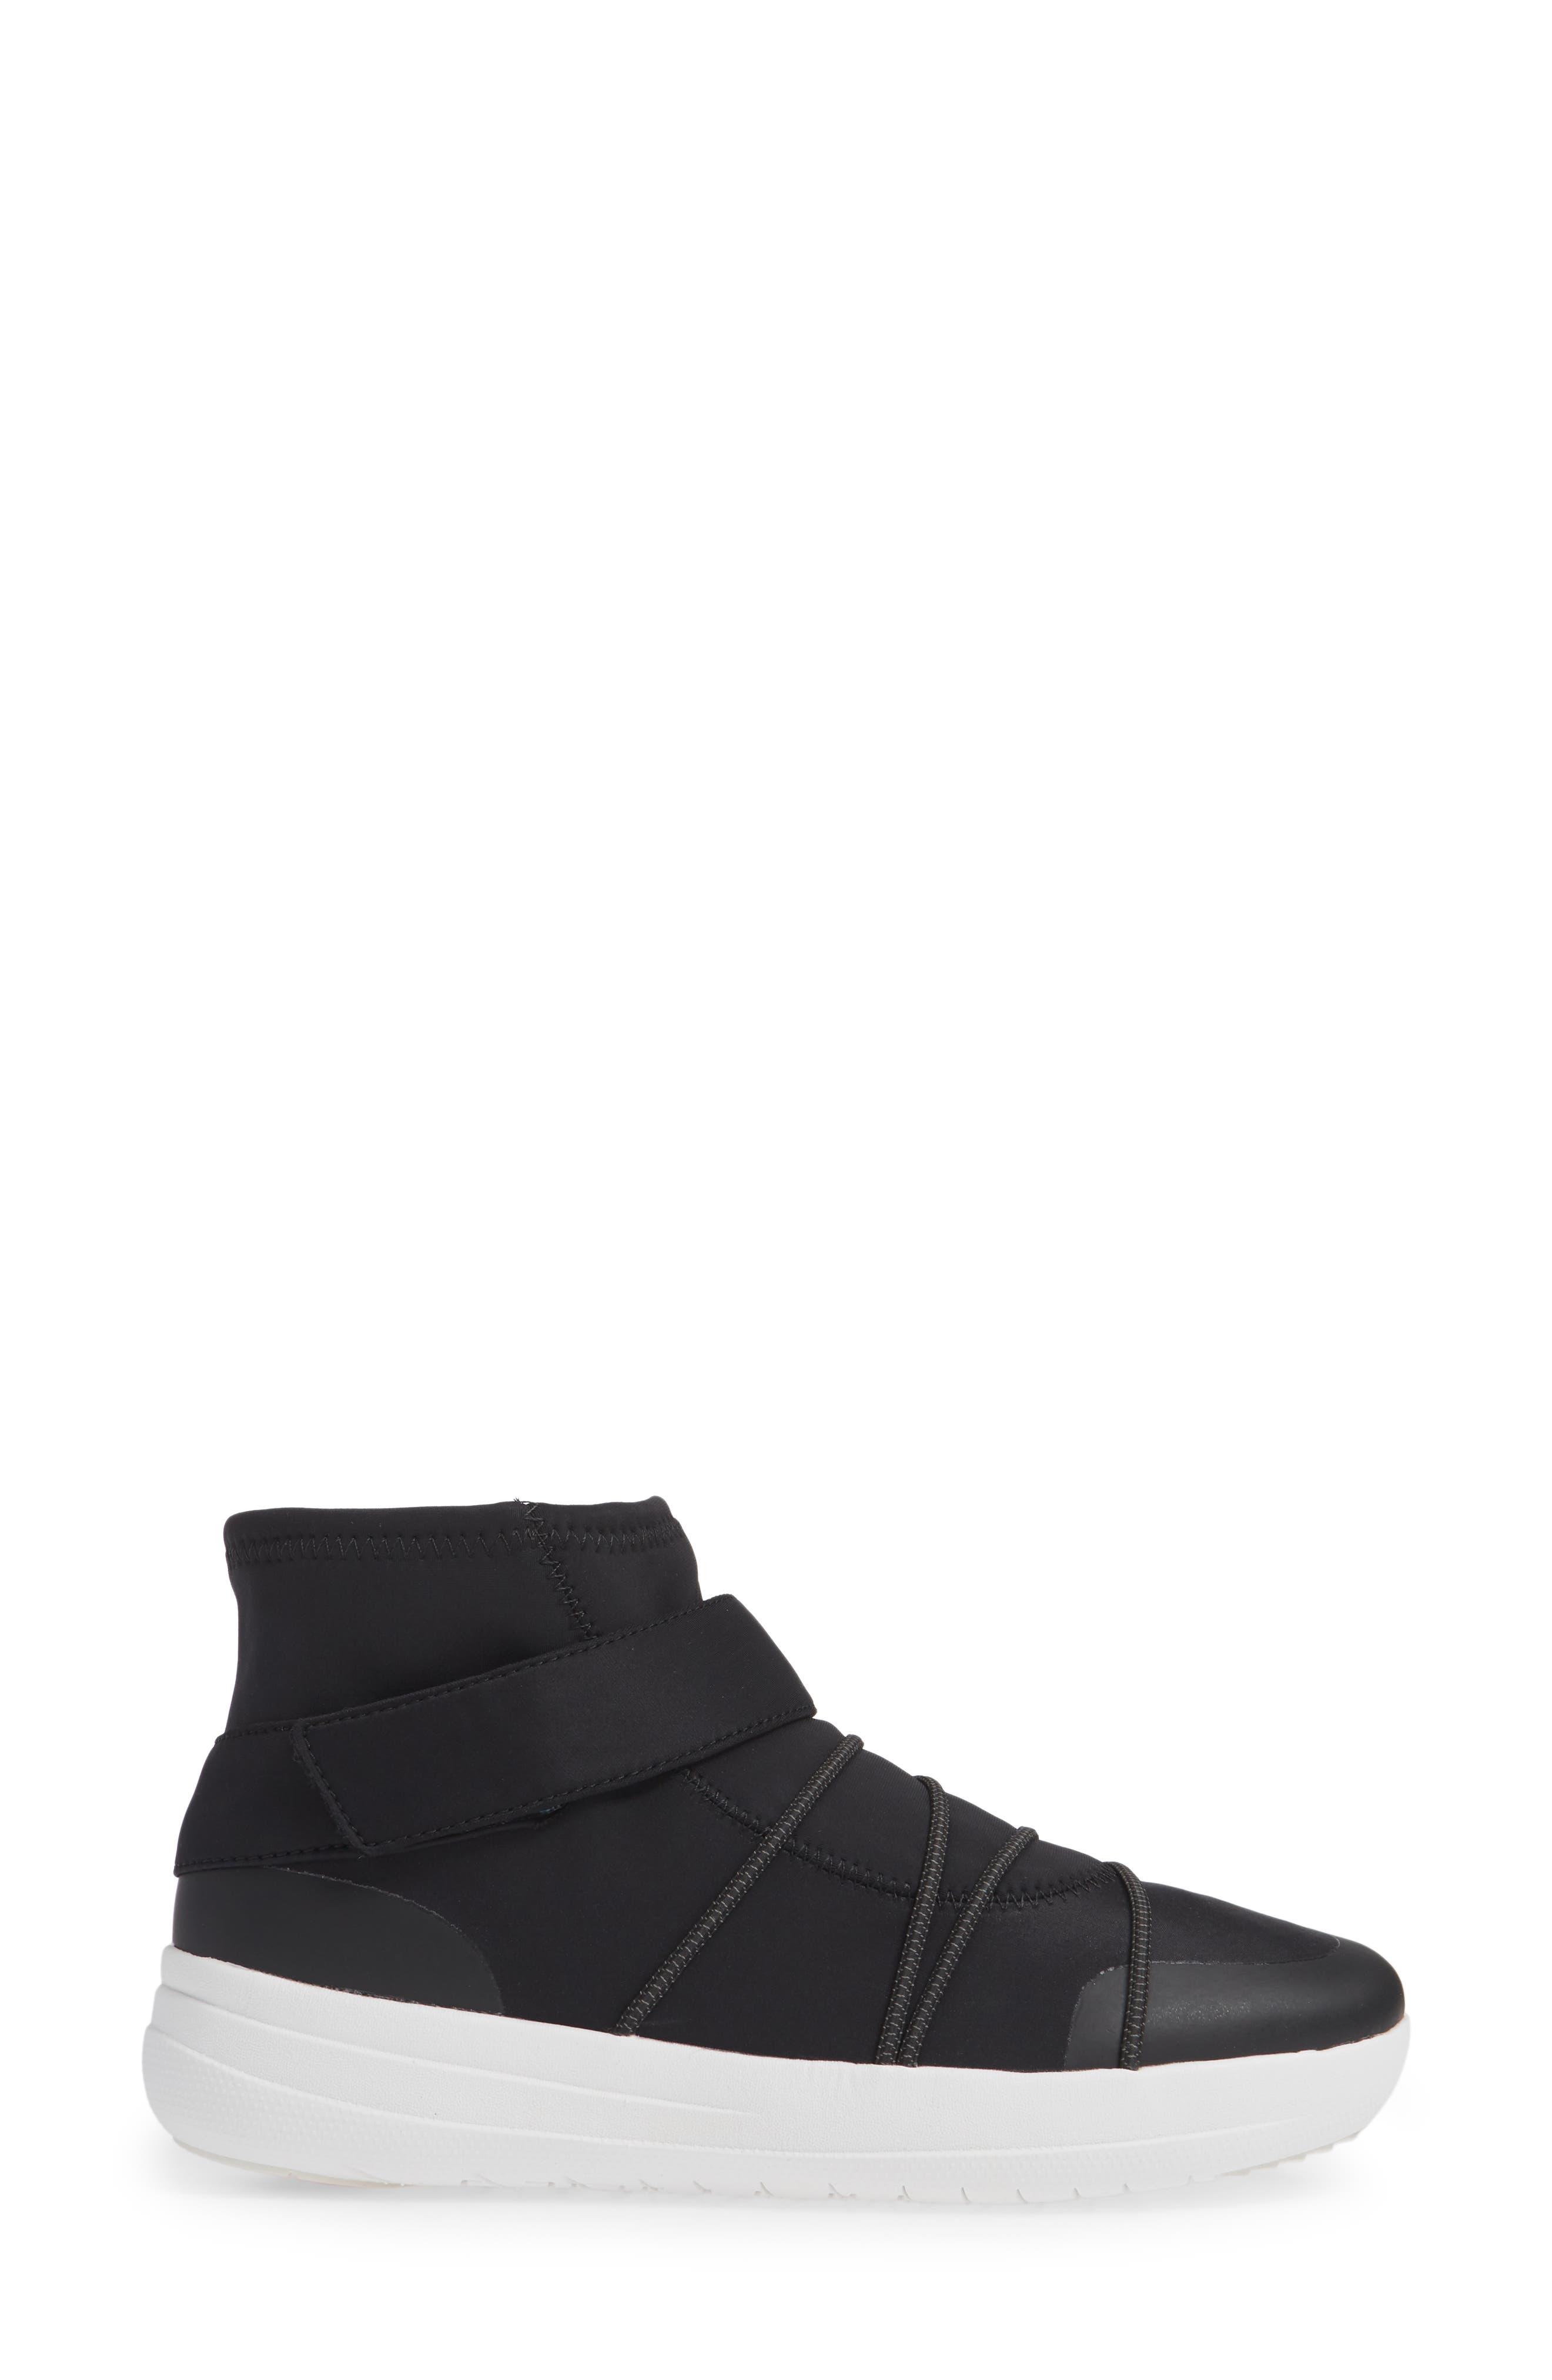 Neoflex High Top Sneaker,                             Alternate thumbnail 3, color,                             BLACK FABRIC